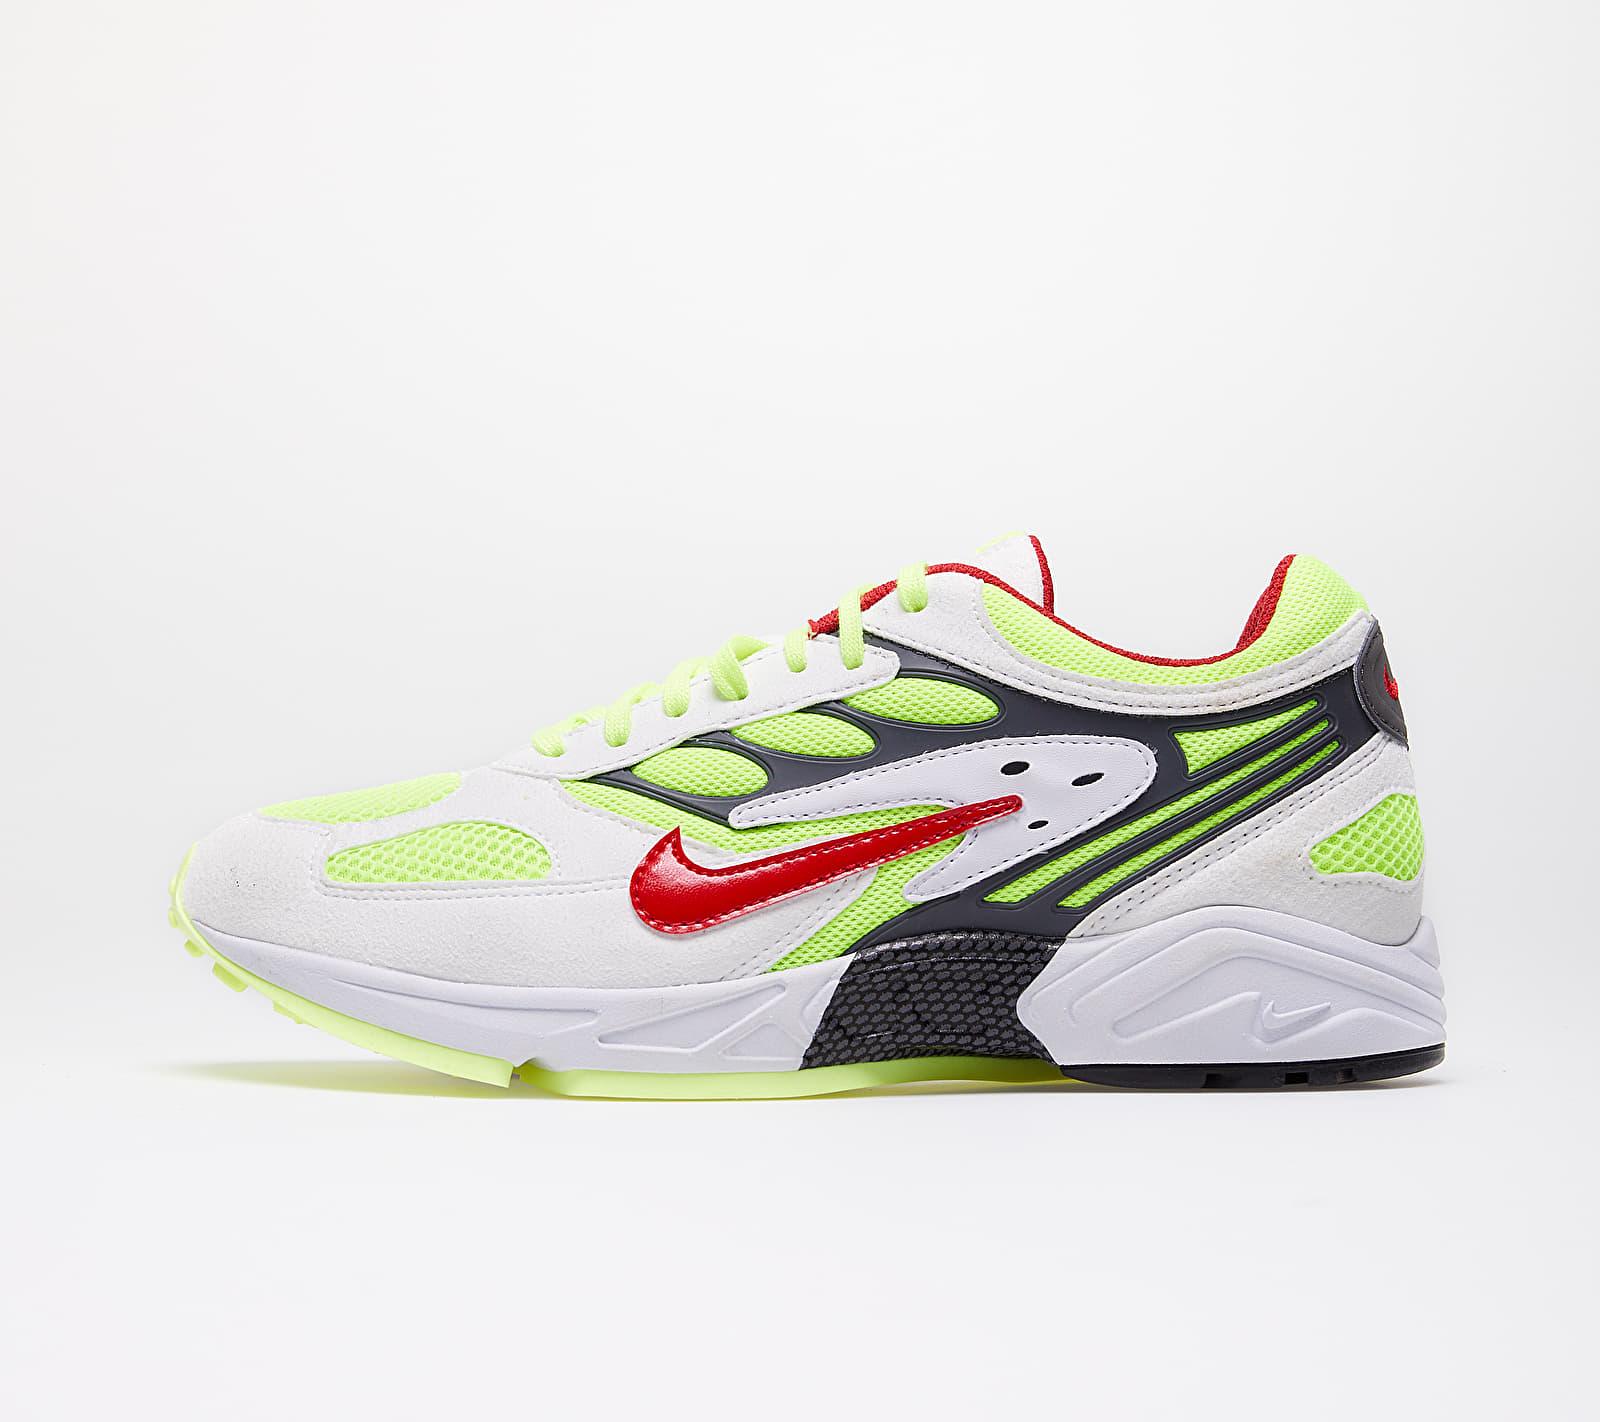 Nike Air Ghost Racer White/ Atom Red-Neon Yellow-Dark Grey EUR 42.5